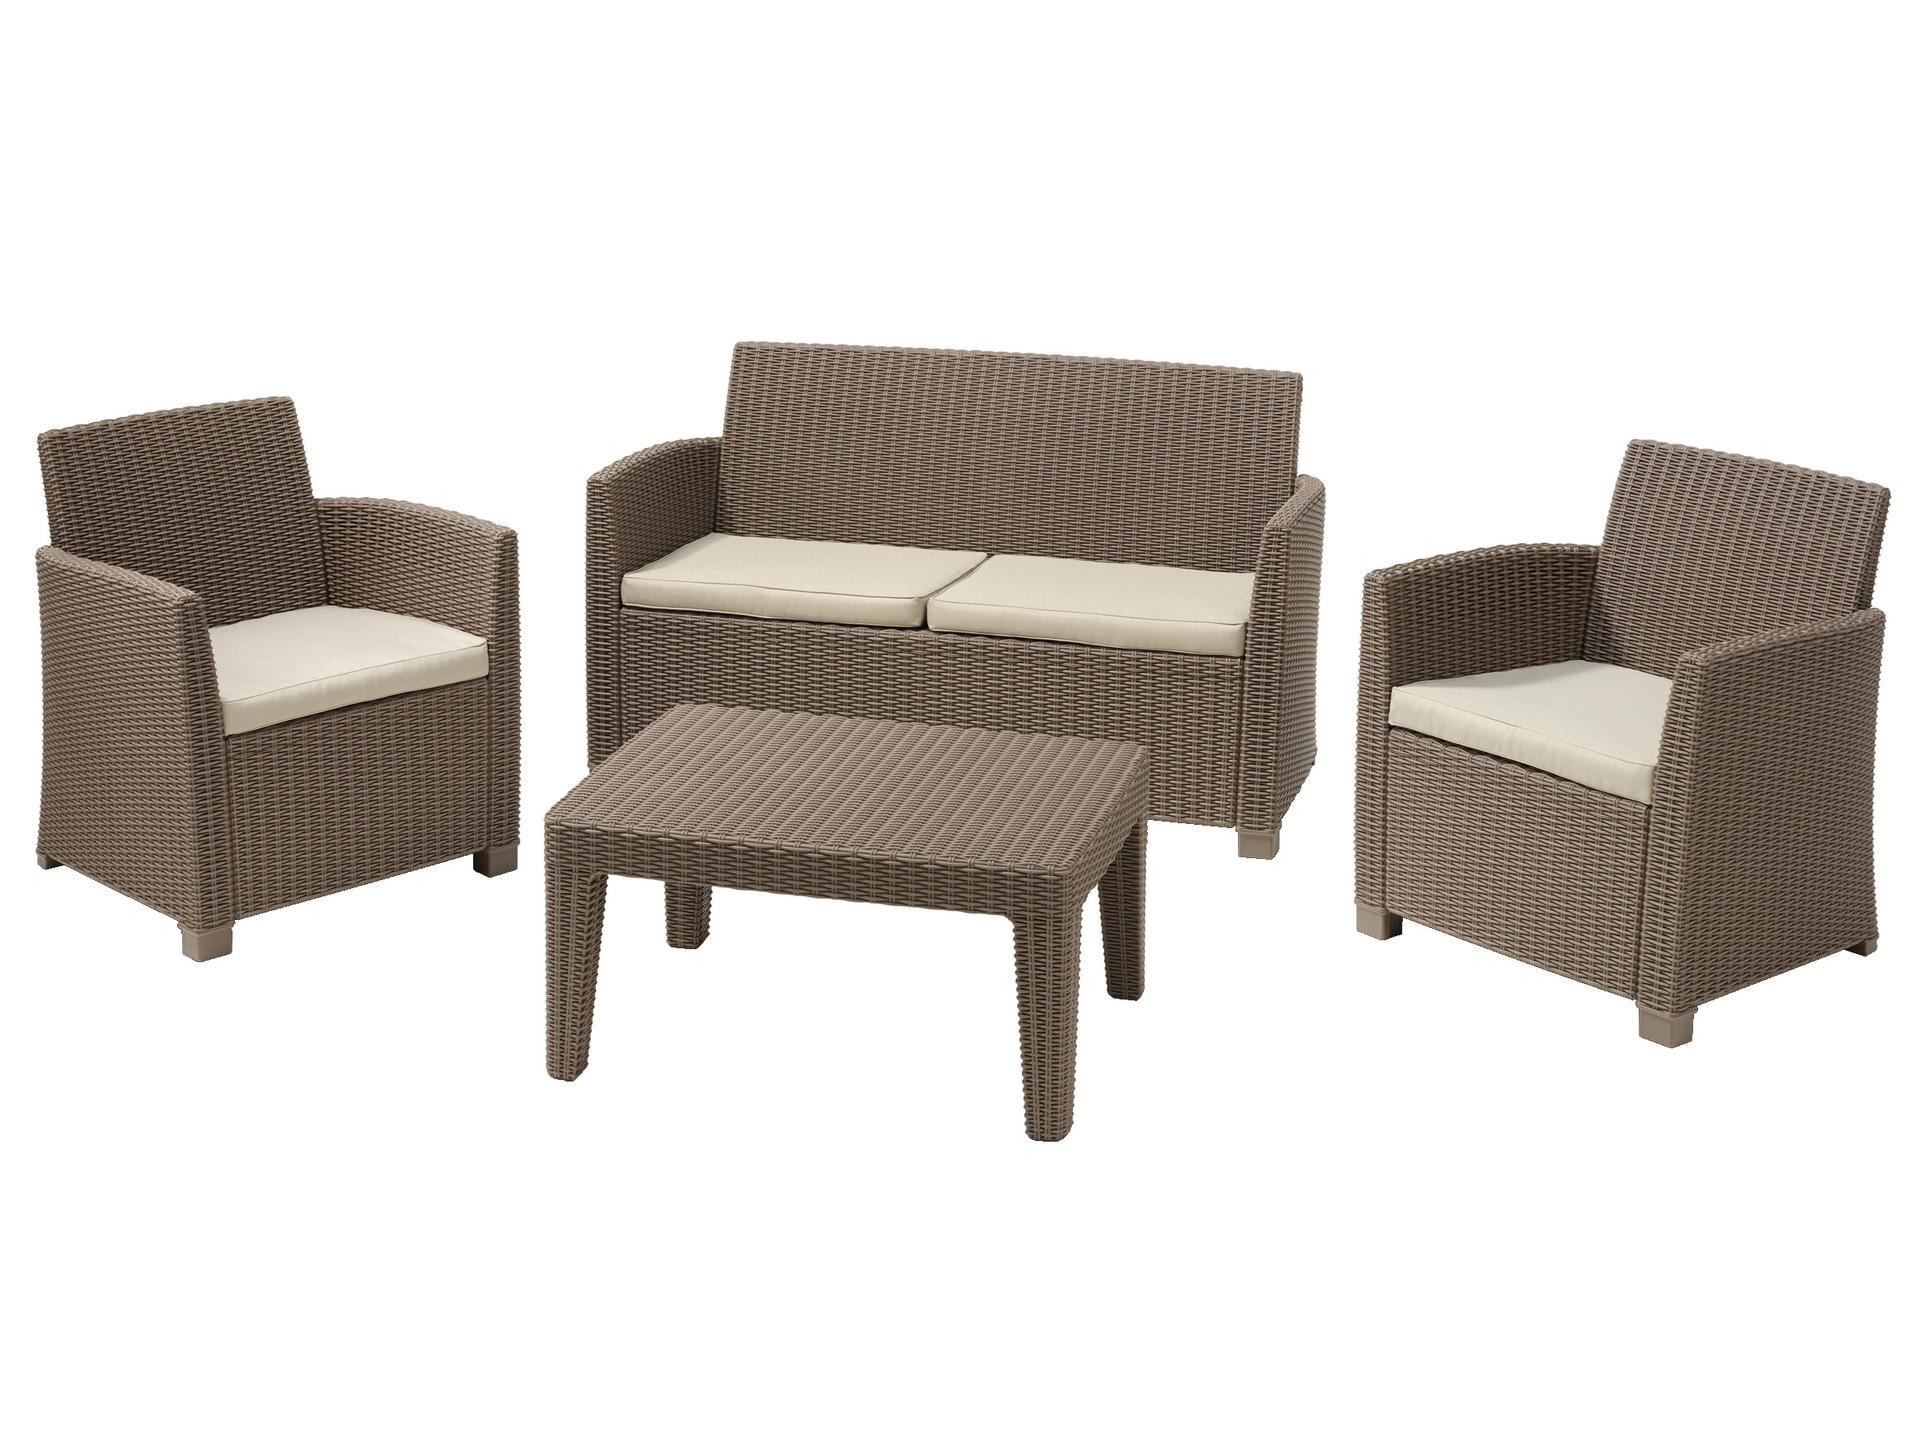 best salon de jardin couleur cappuccino ideas amazing house design. Black Bedroom Furniture Sets. Home Design Ideas